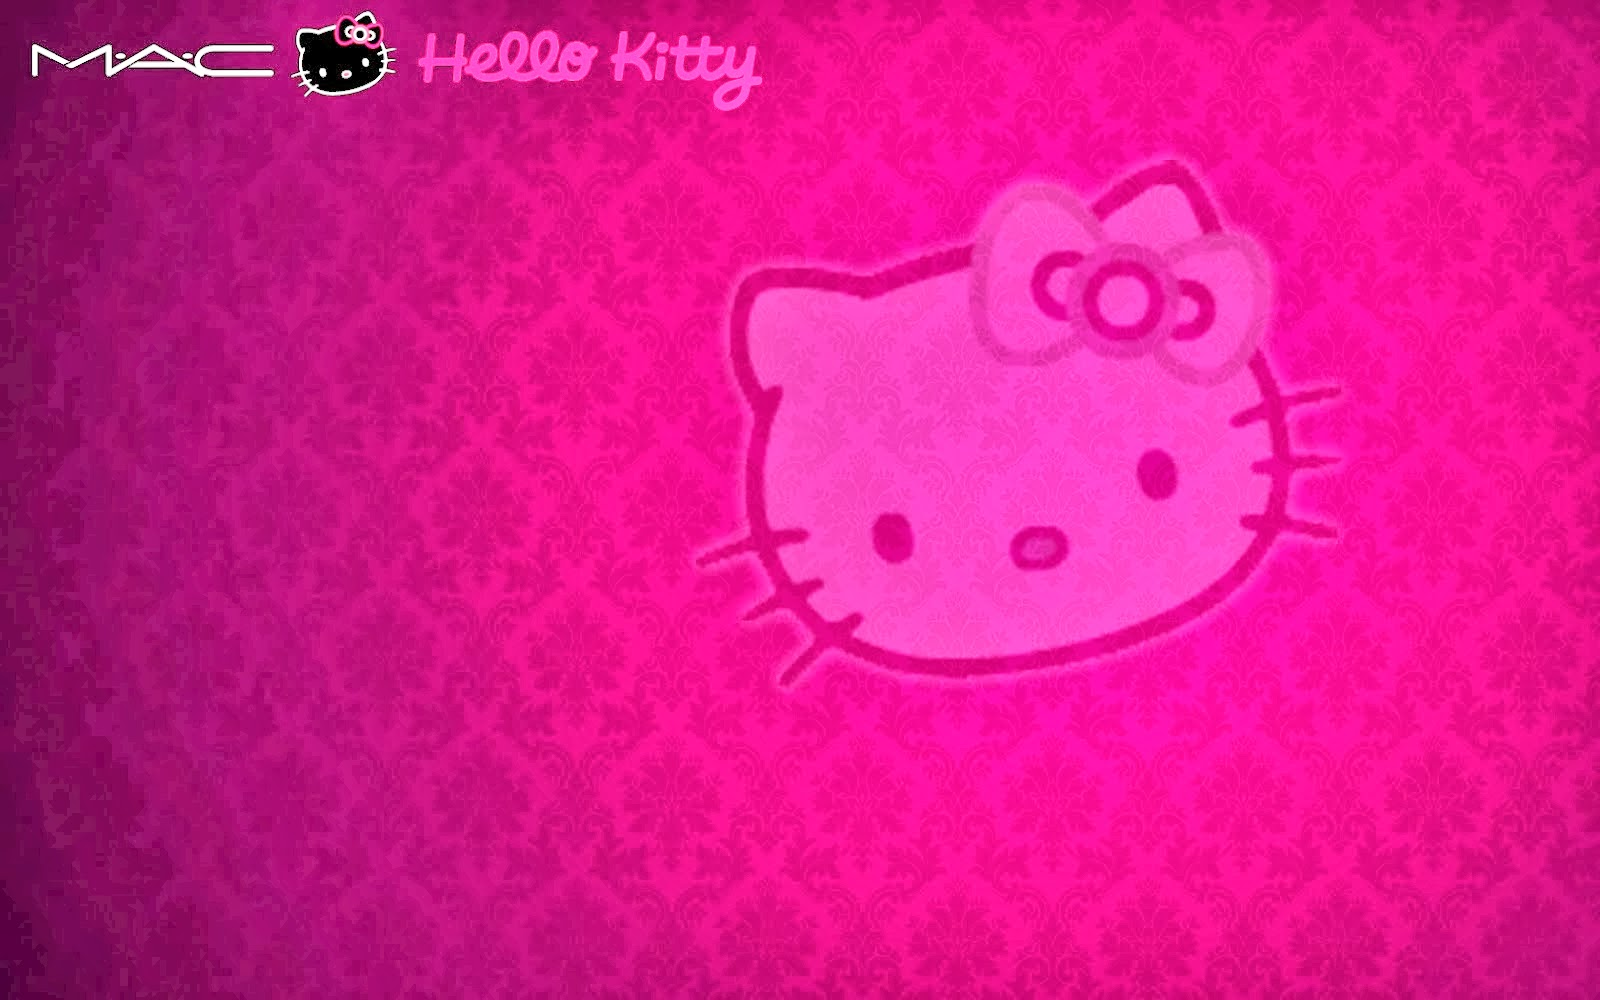 Hd wallpaper animasi - Gambar Hello Kitty Wallpaper Wallpapersafari